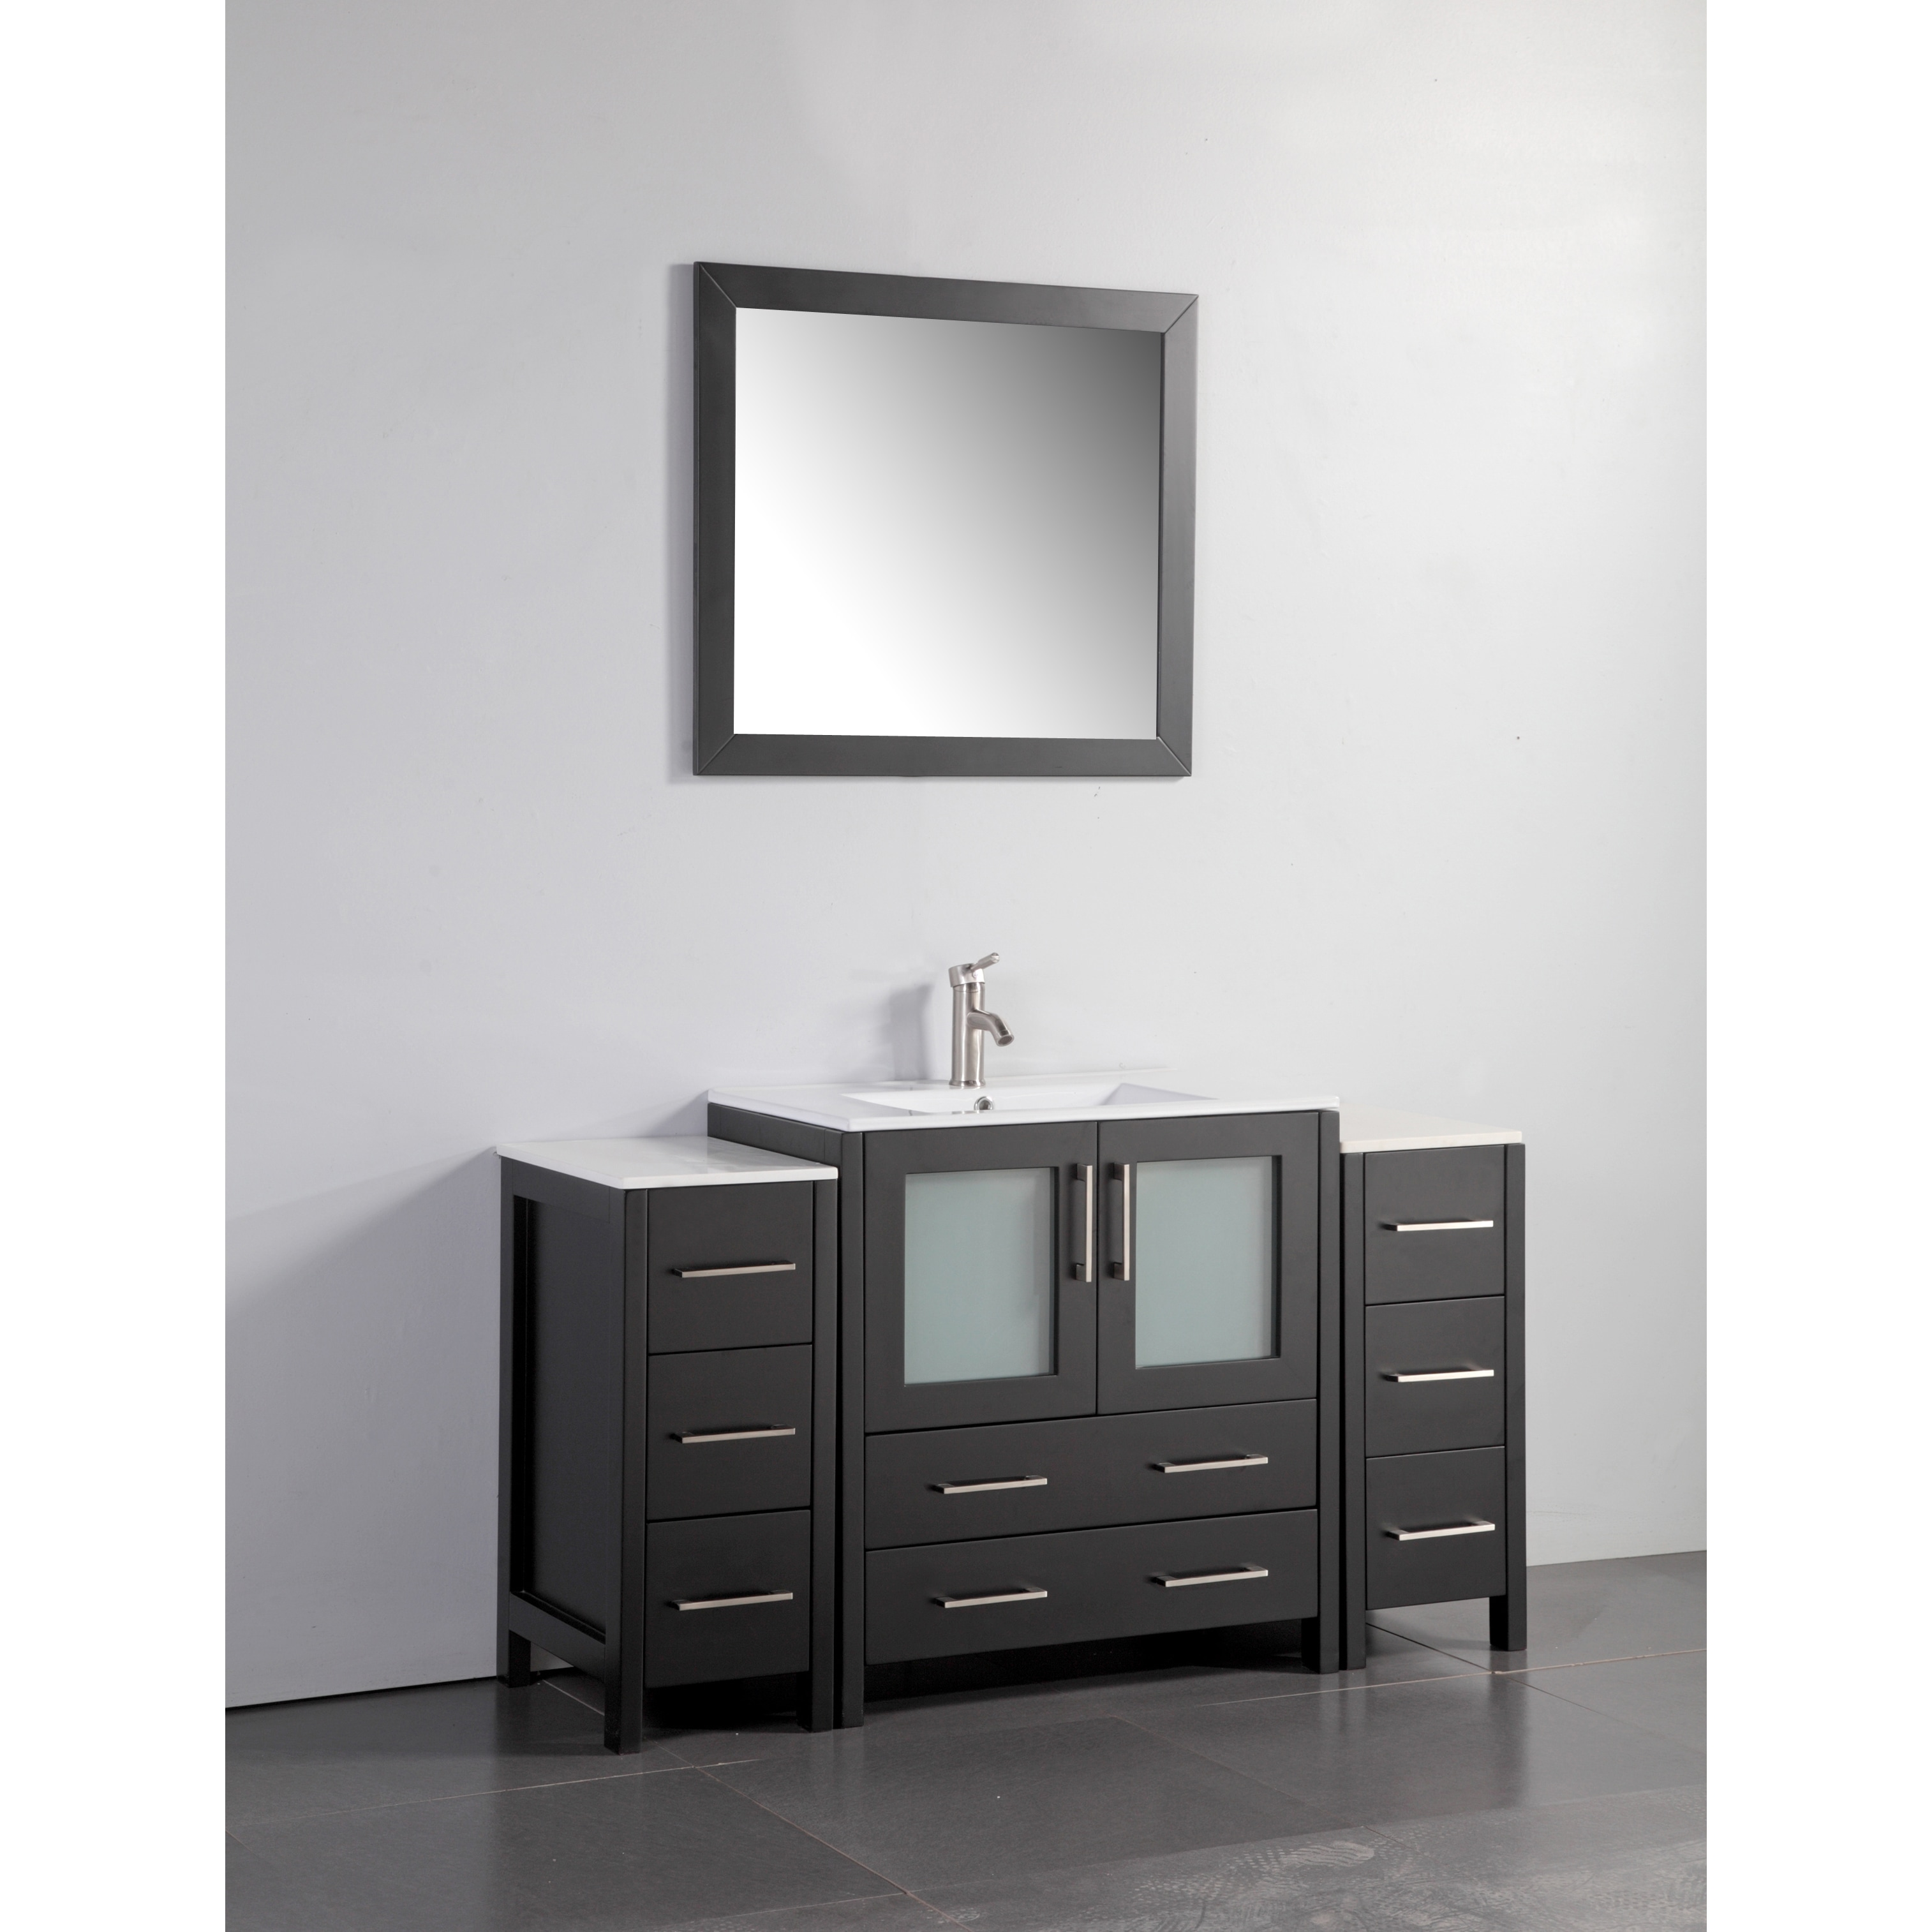 vanity art 54 inch single sink bathroom vanity set ebay. Black Bedroom Furniture Sets. Home Design Ideas